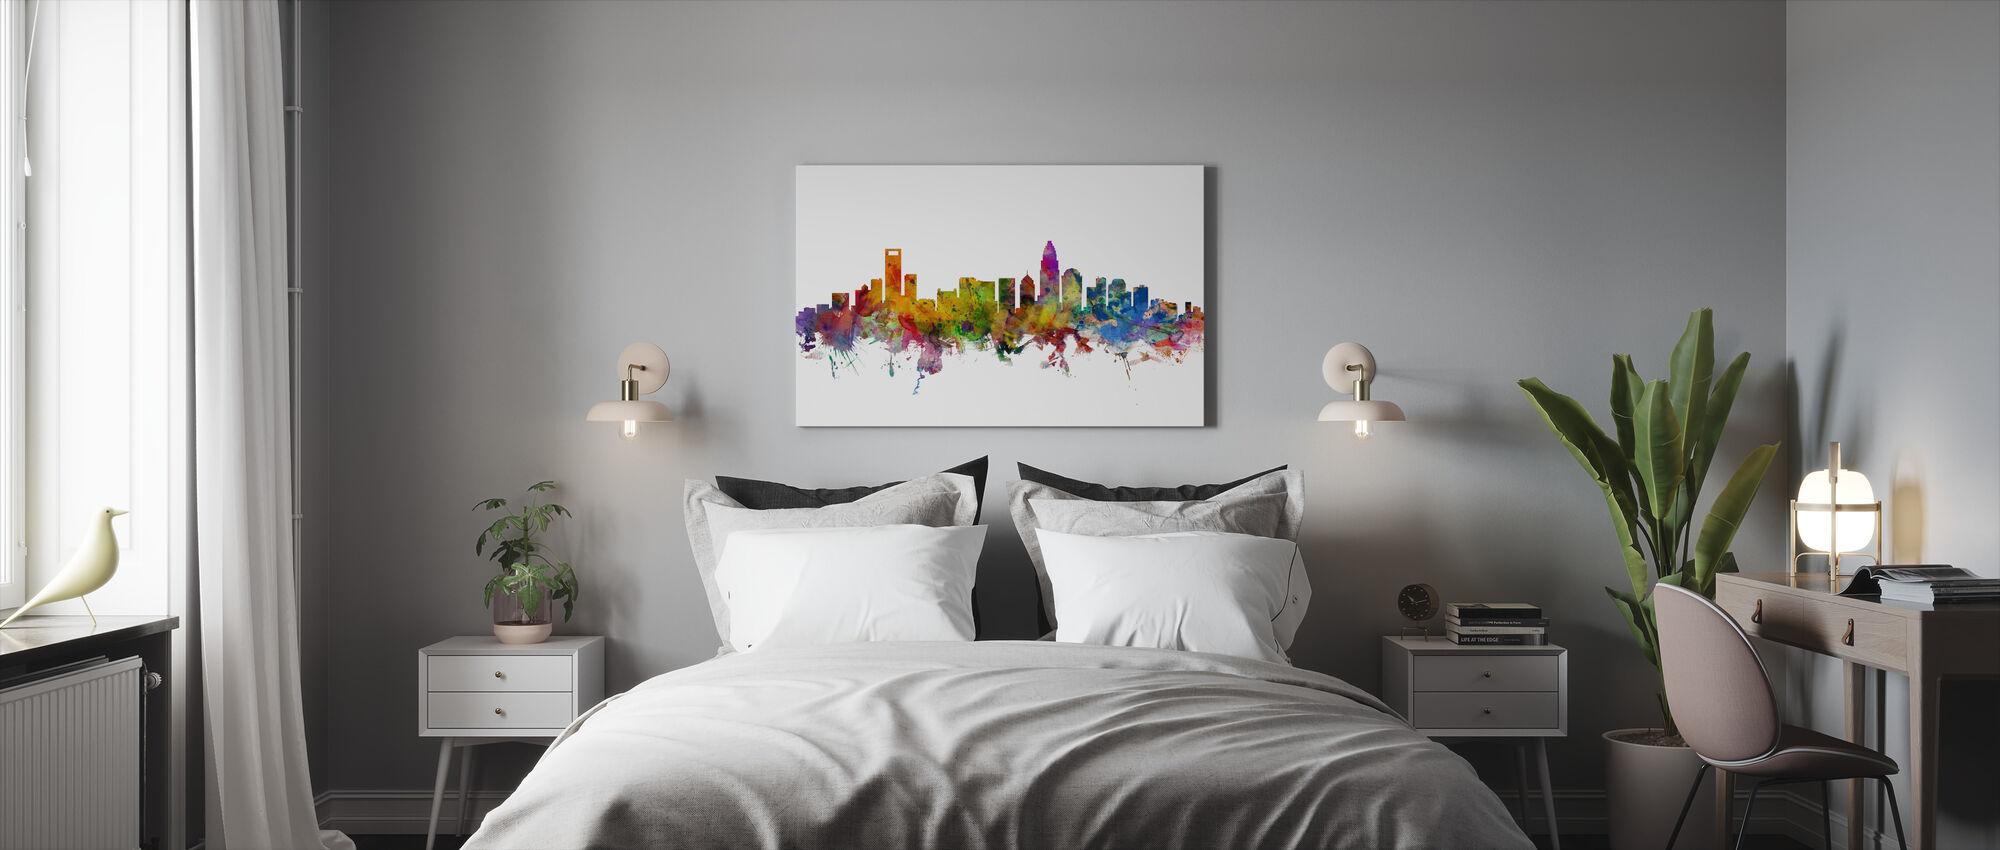 Charlotte North Carolina Skyline - Canvas print - Bedroom